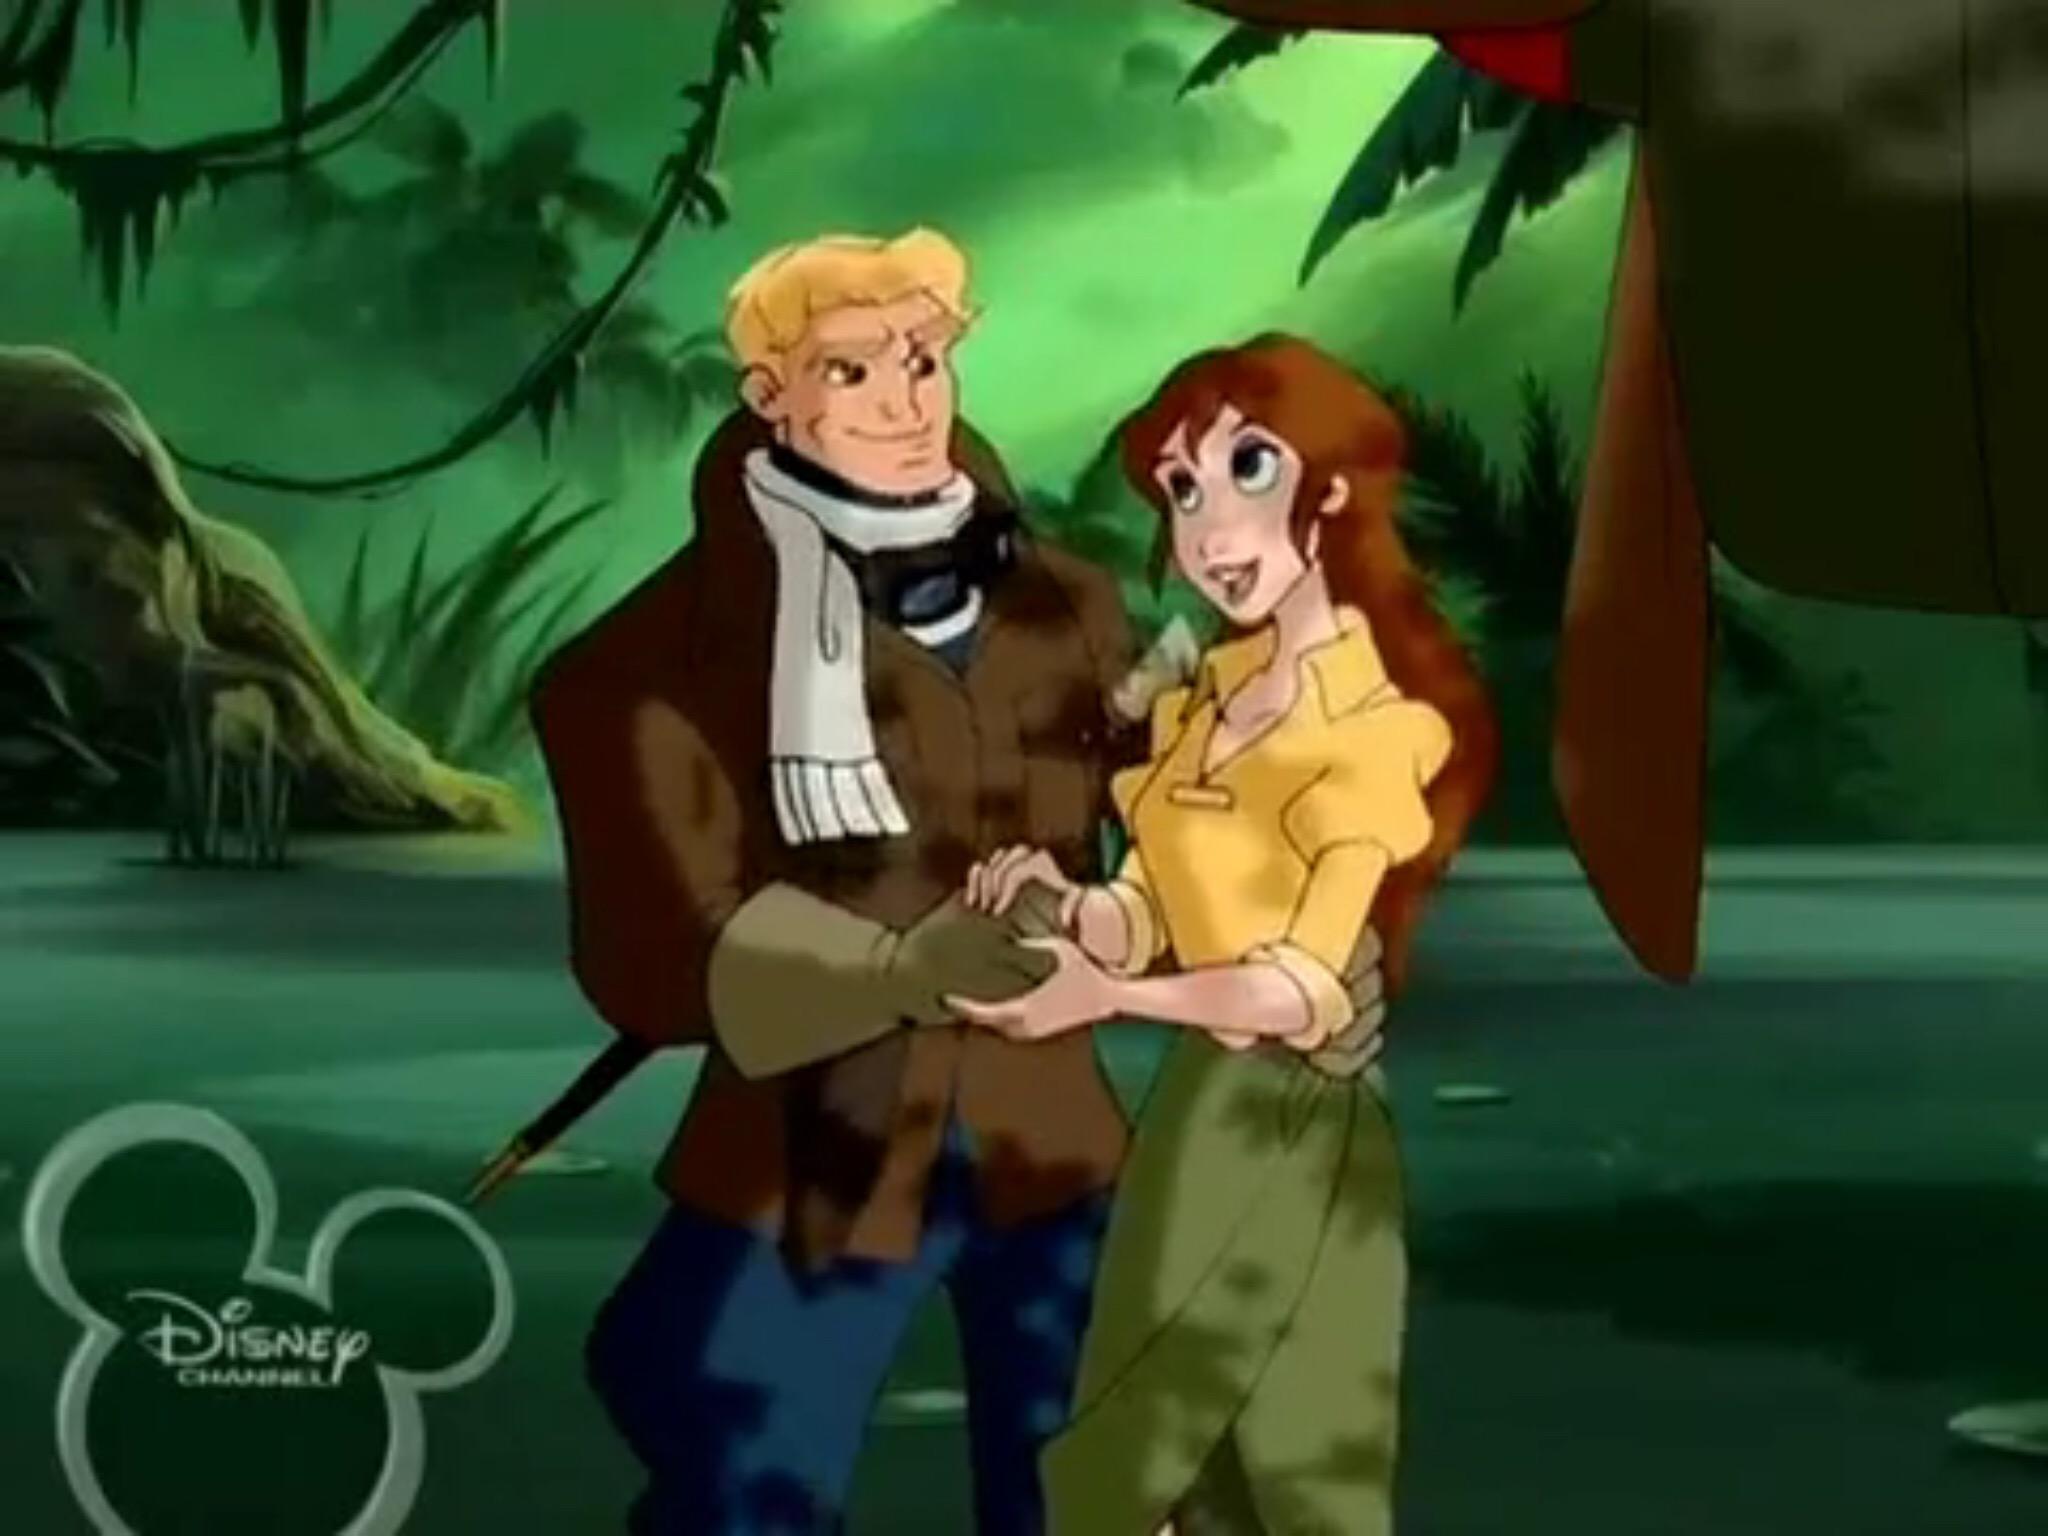 Tarzan and the Flying Ace